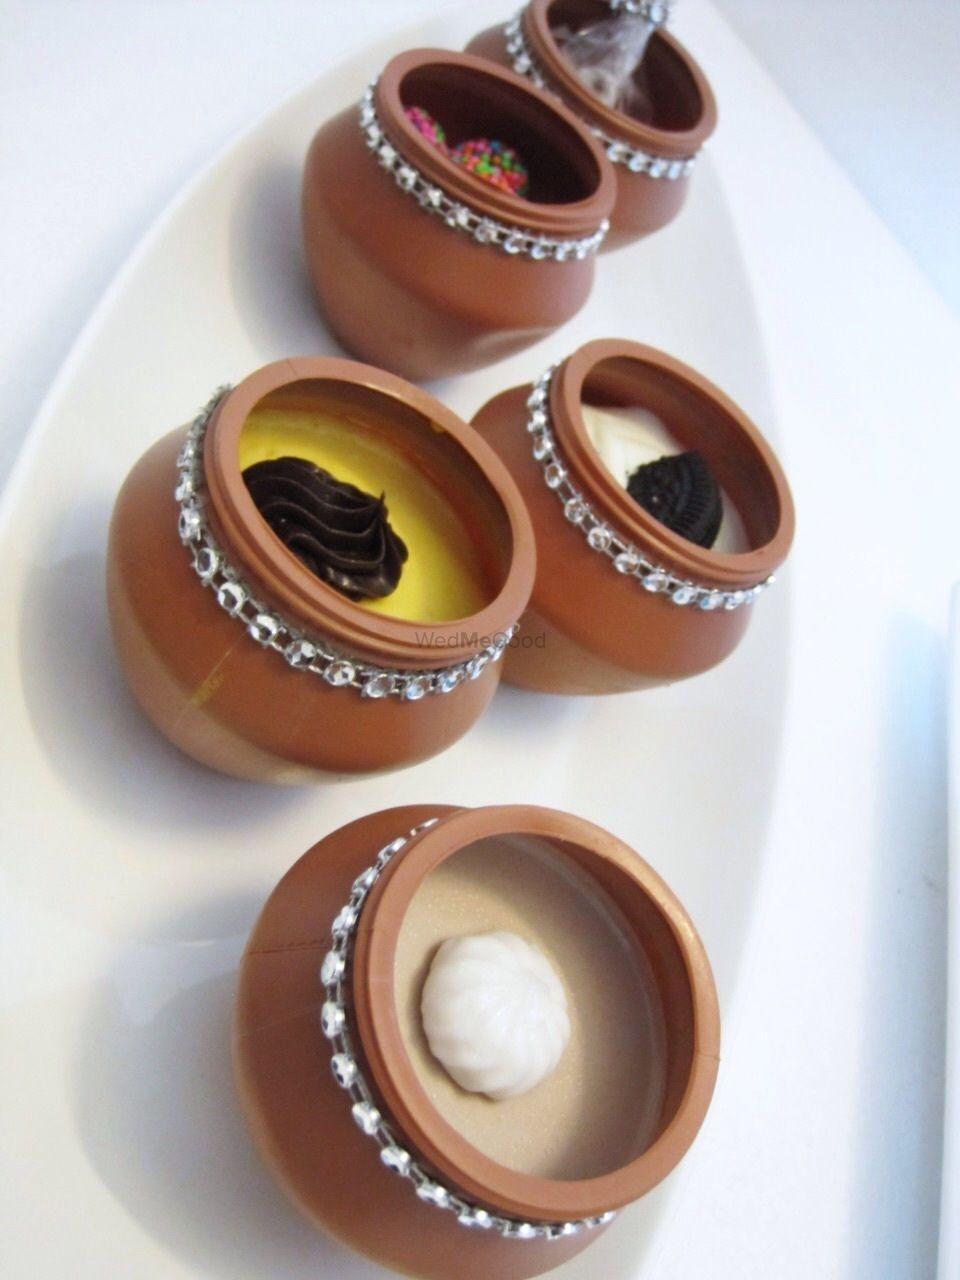 Photo From Wedding dessert caterings - By Matisse Cake Design Studio